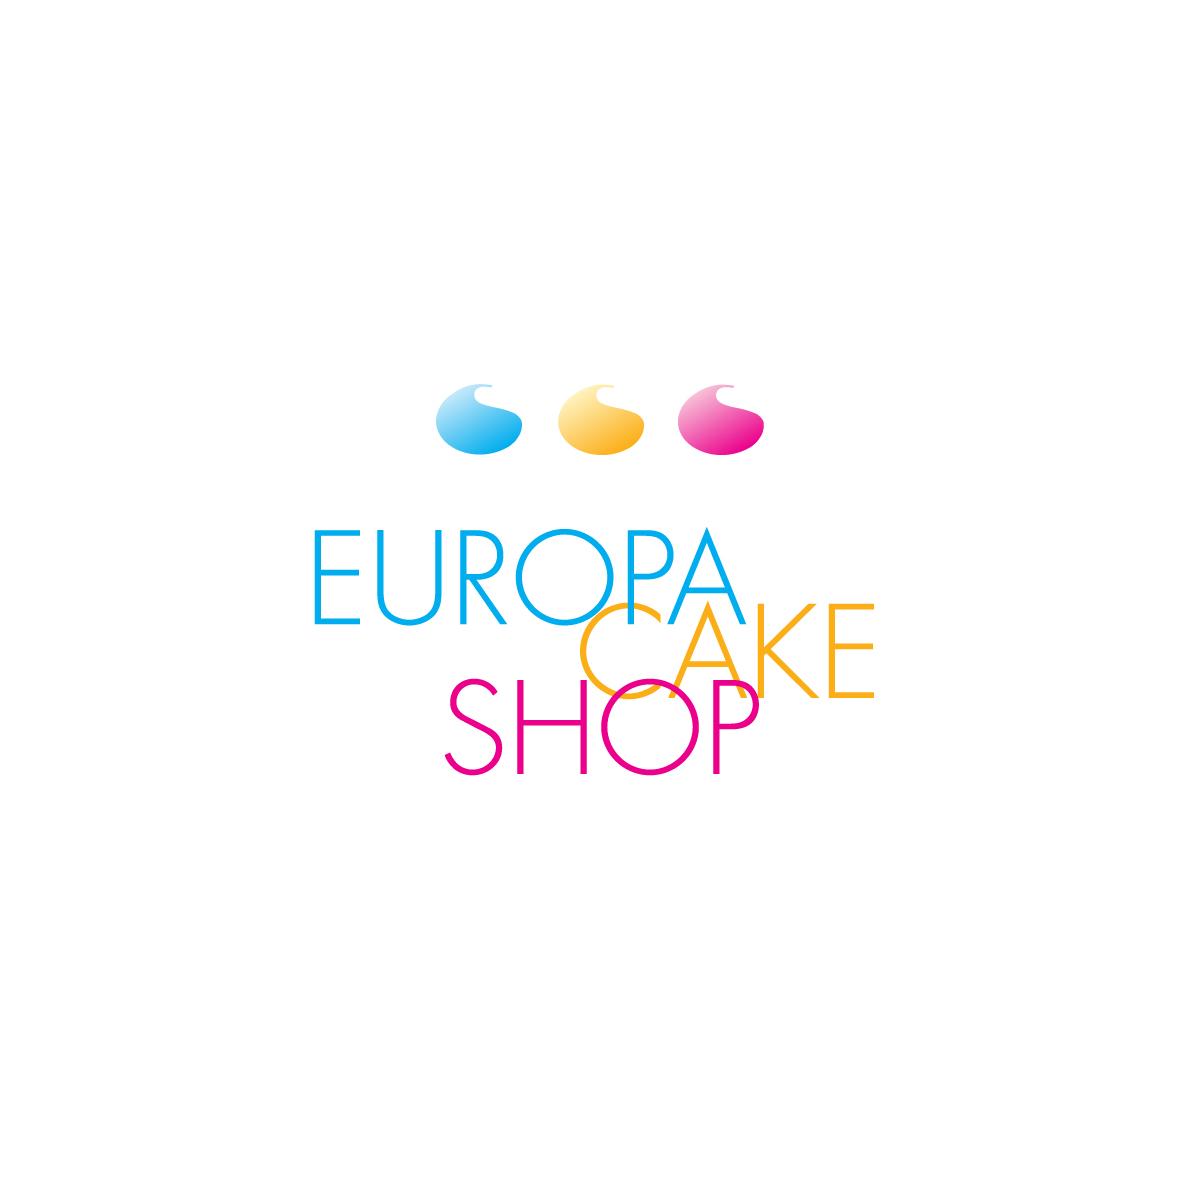 Europa Cake Shop - St Kilda